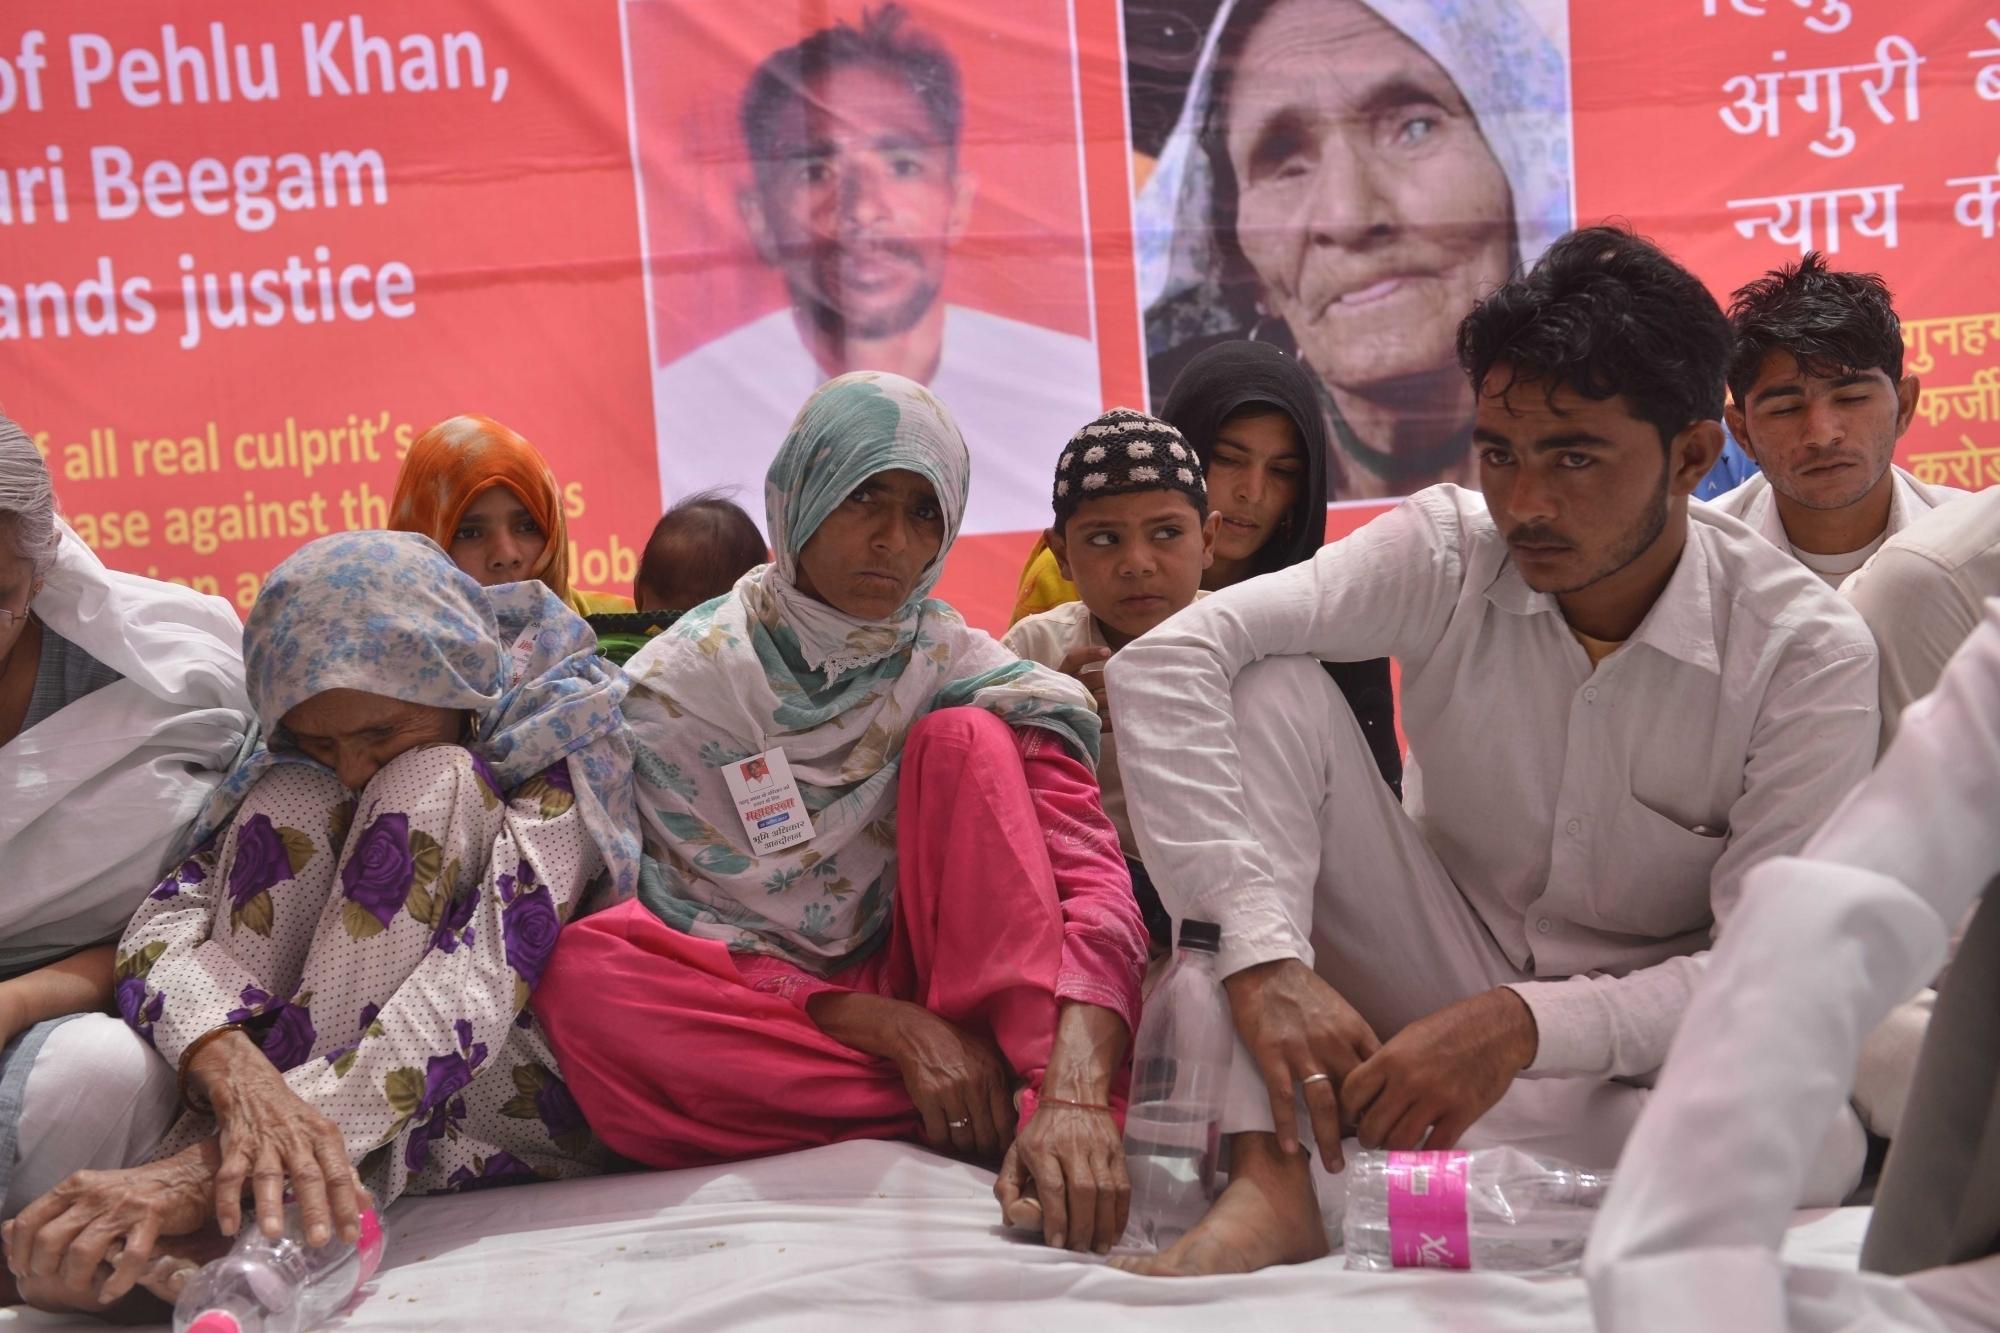 Pehlu Khan's relatives. Photo: HT